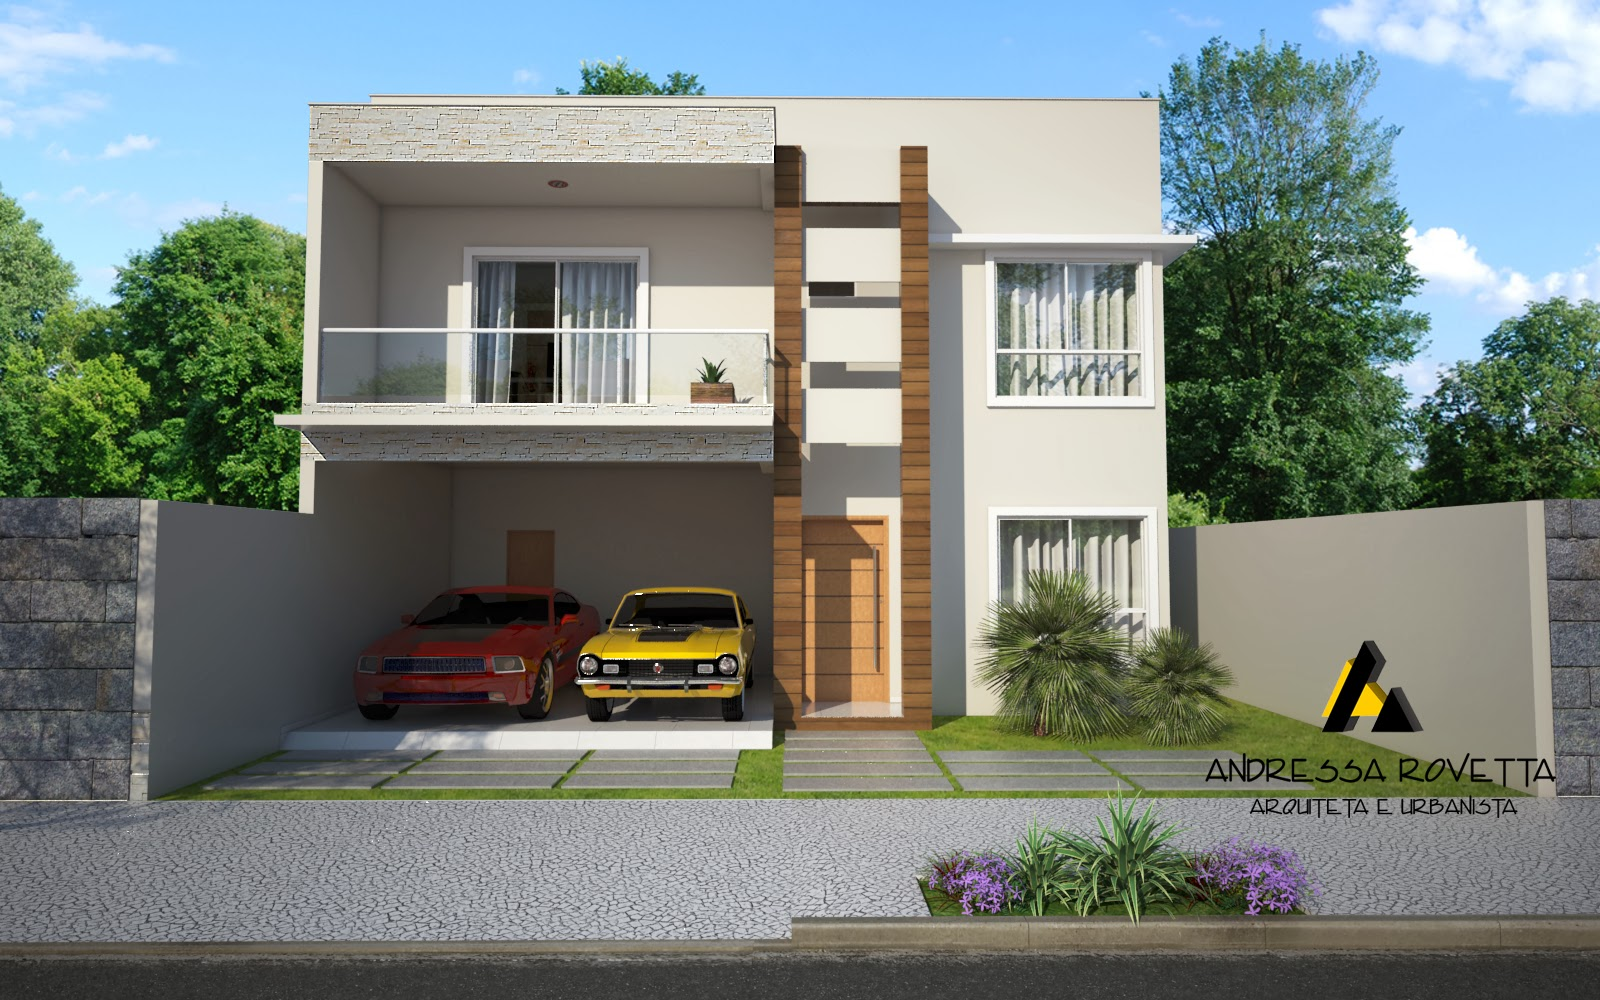 Fachadas de casas duplex car interior design for Fachadas duplex minimalistas